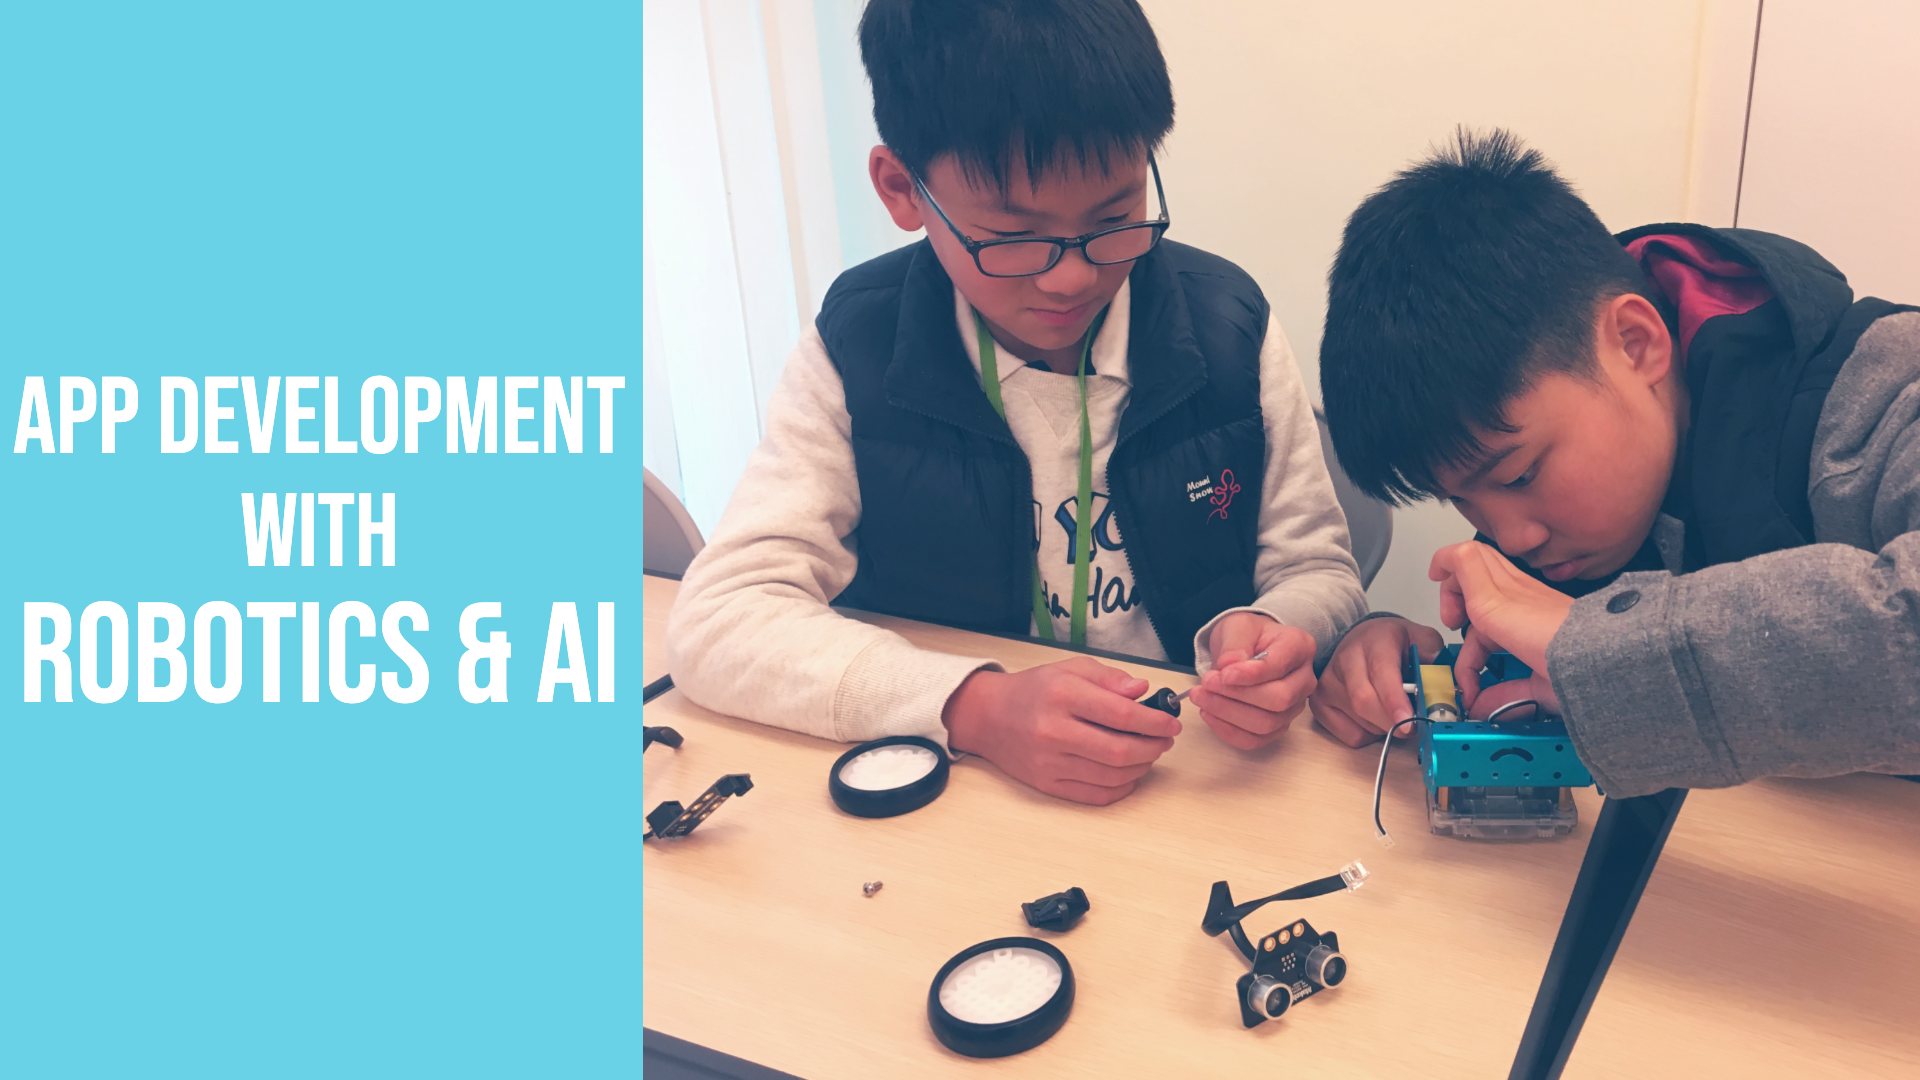 App Development with Robotics and AI